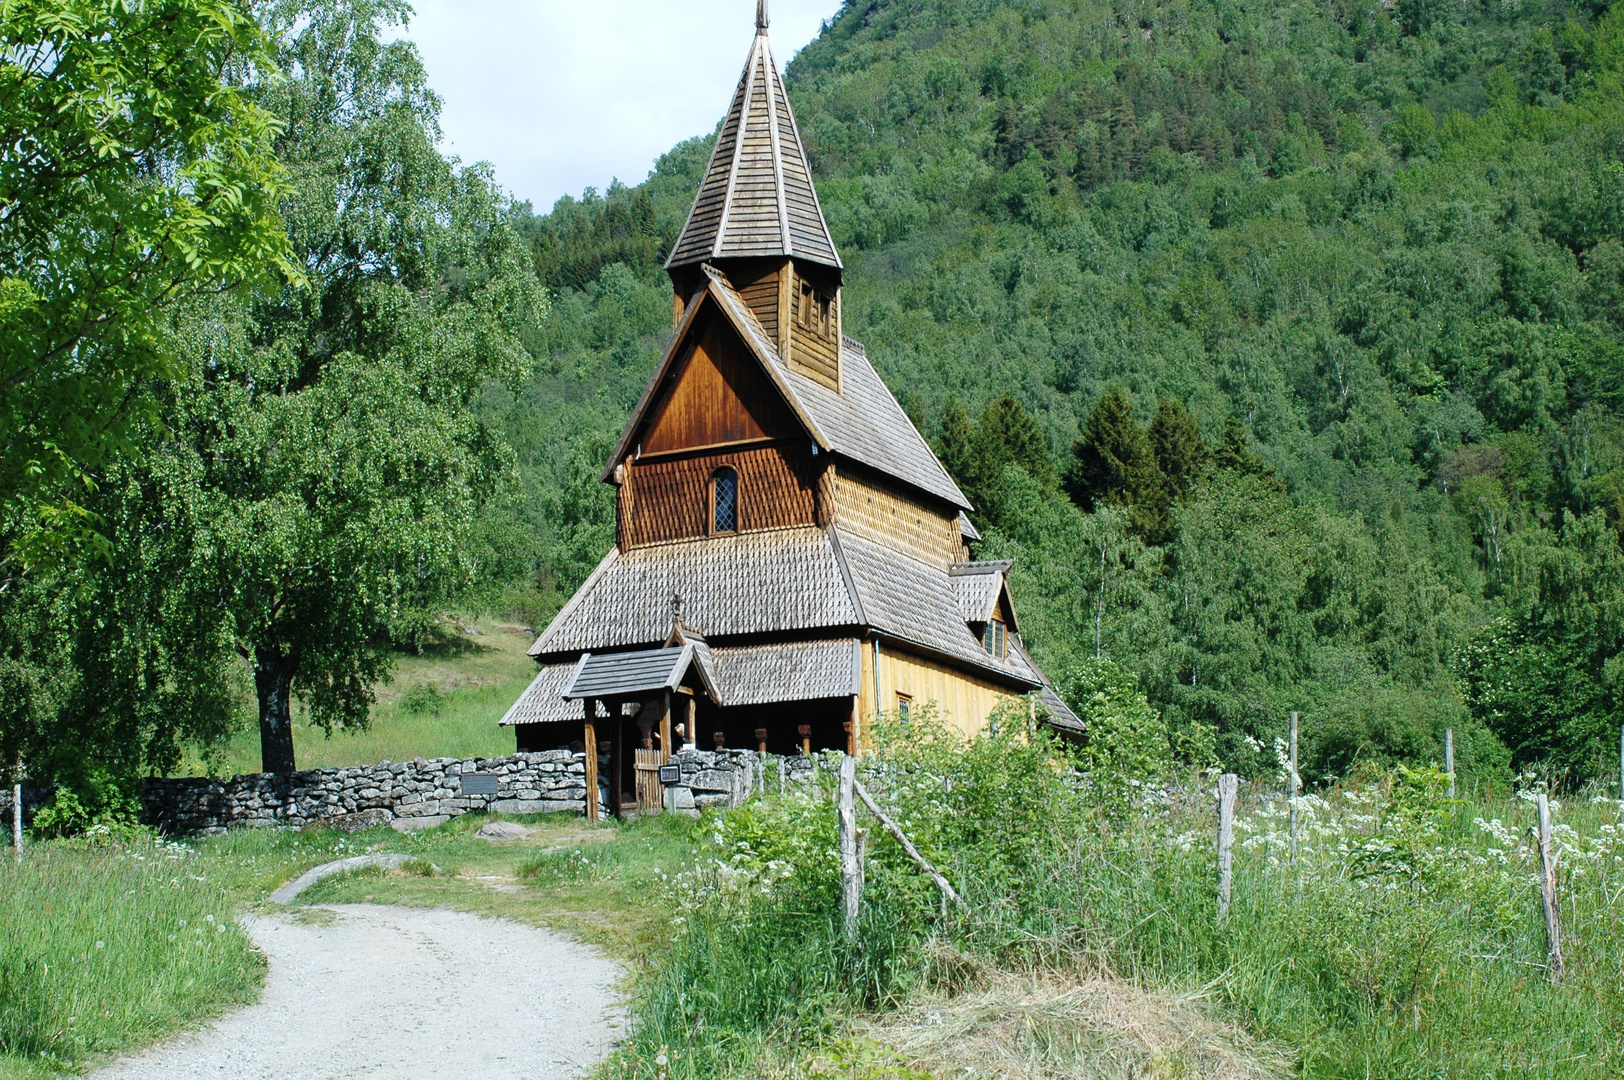 Urnes, älteste Stabkirche Norwegens